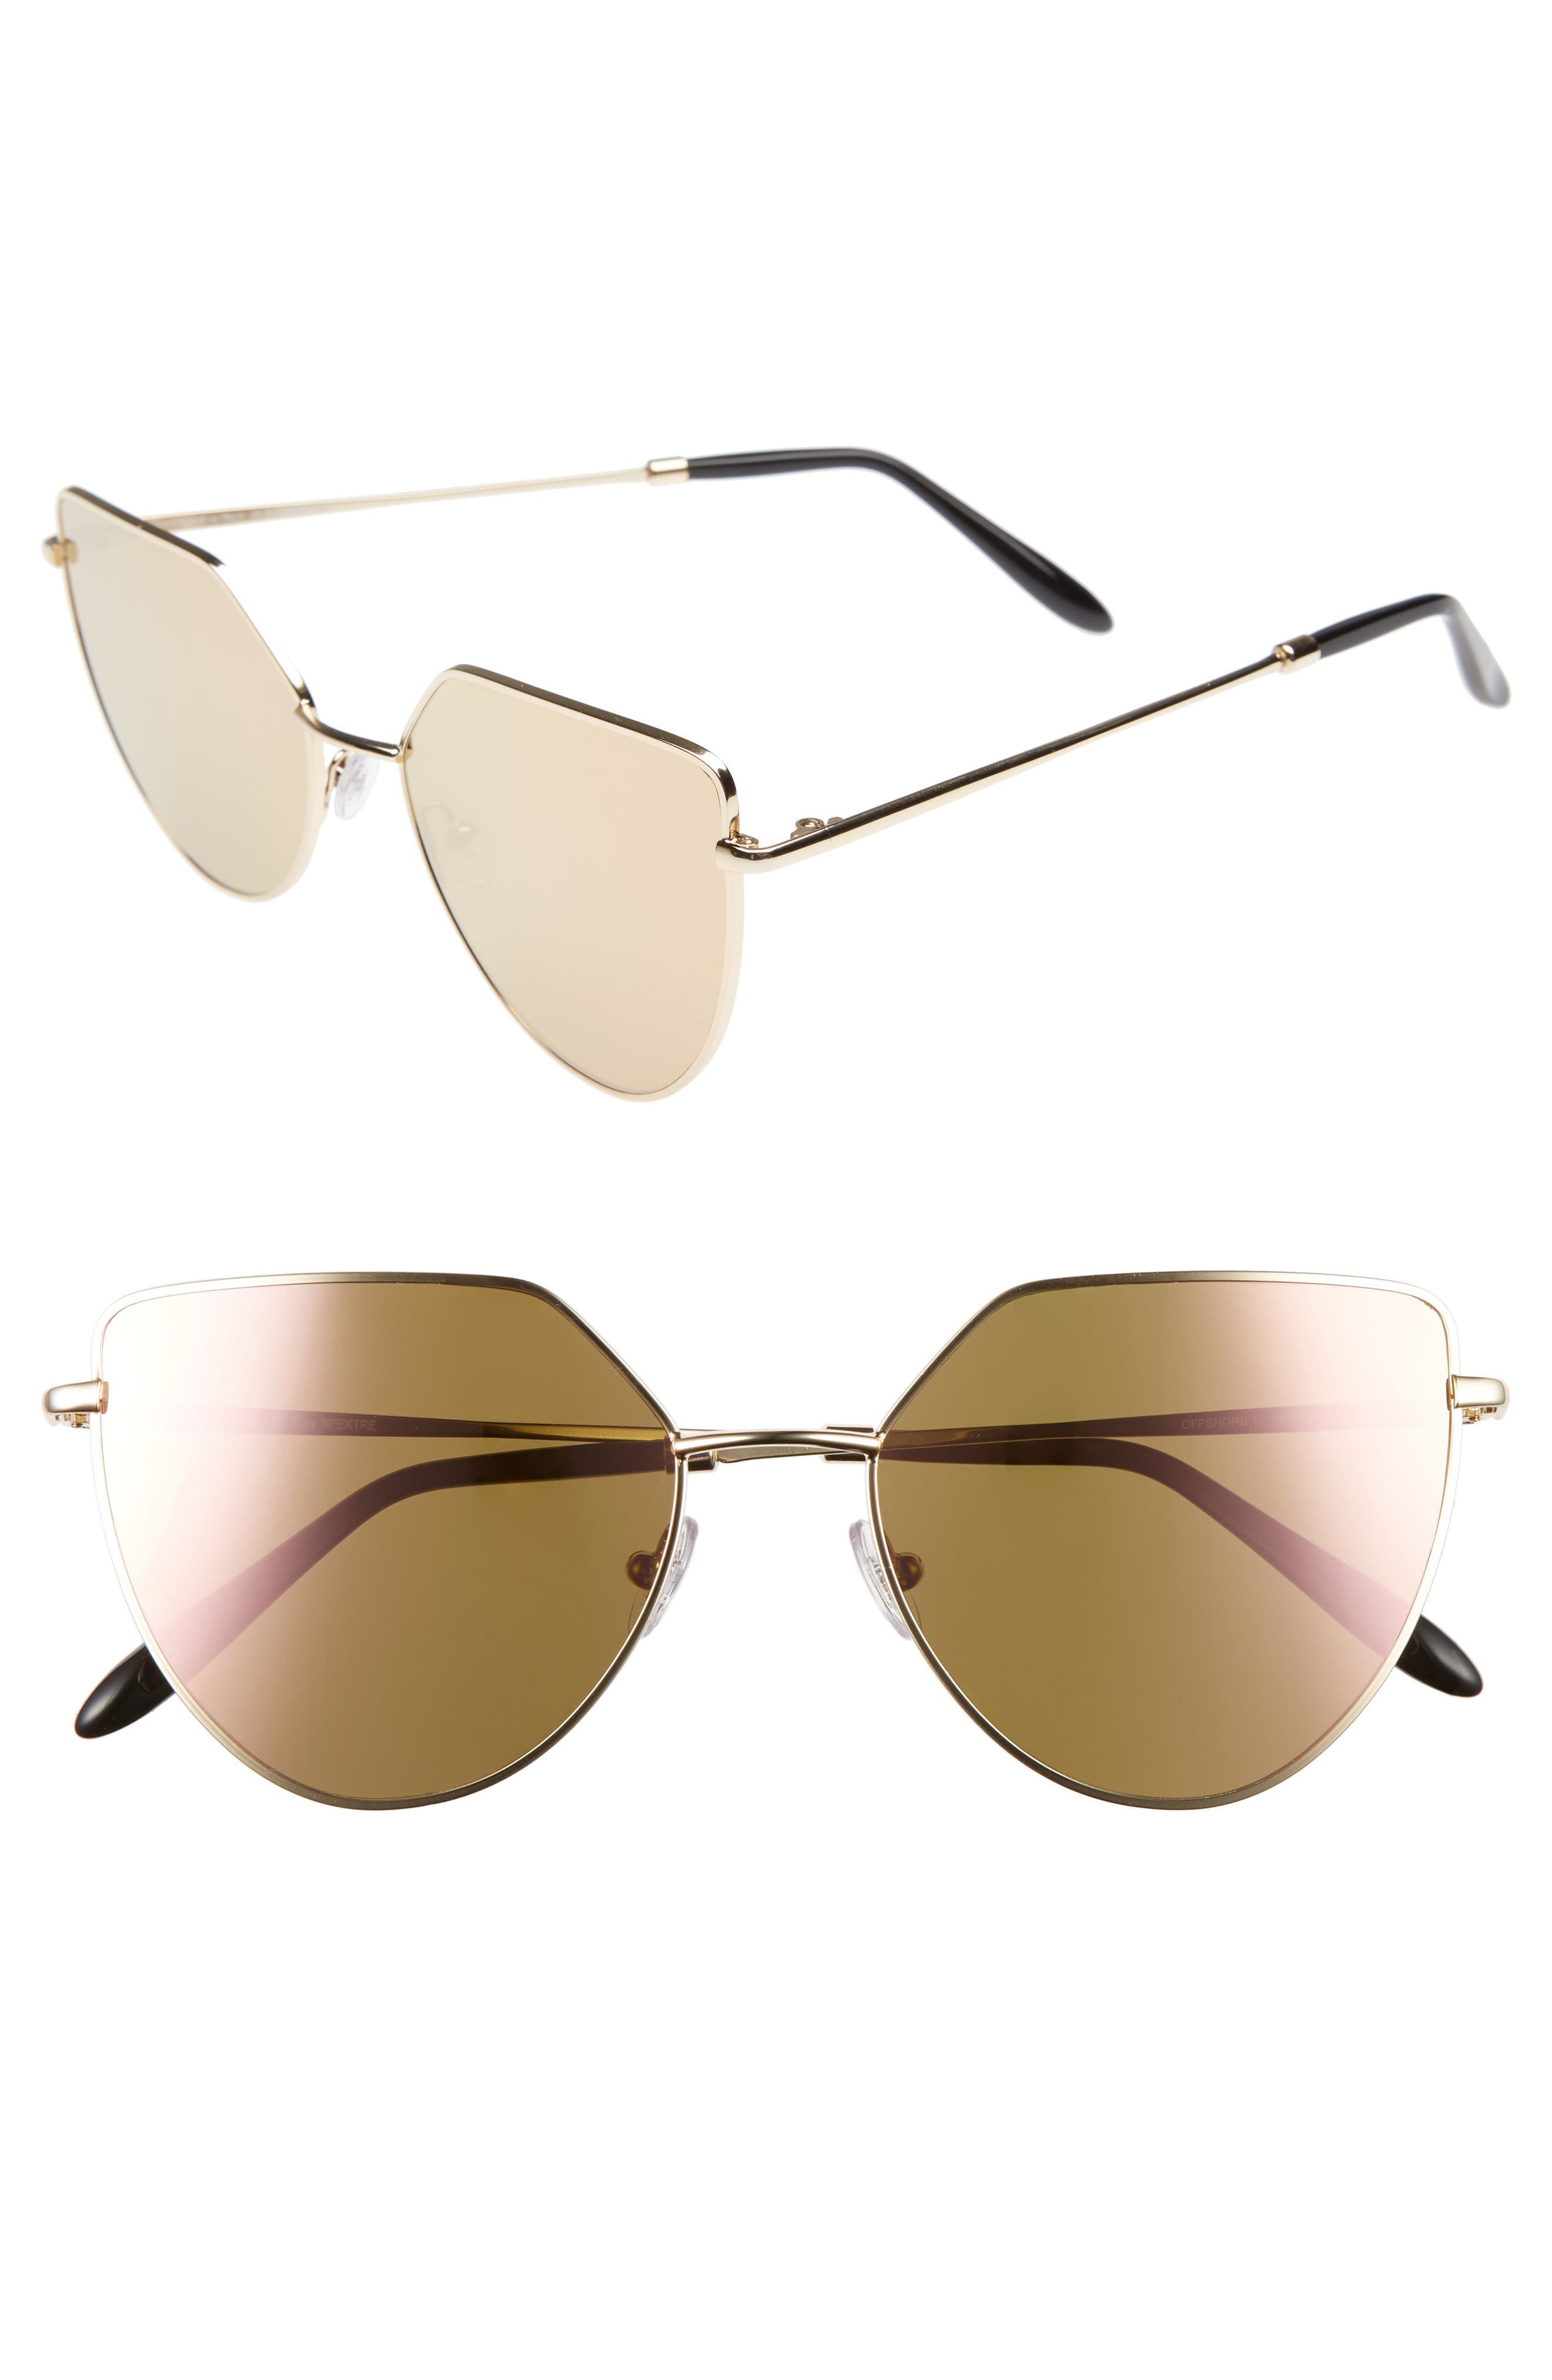 Main Image - Spektre Off Shore 1 54mm Retro Sunglasses